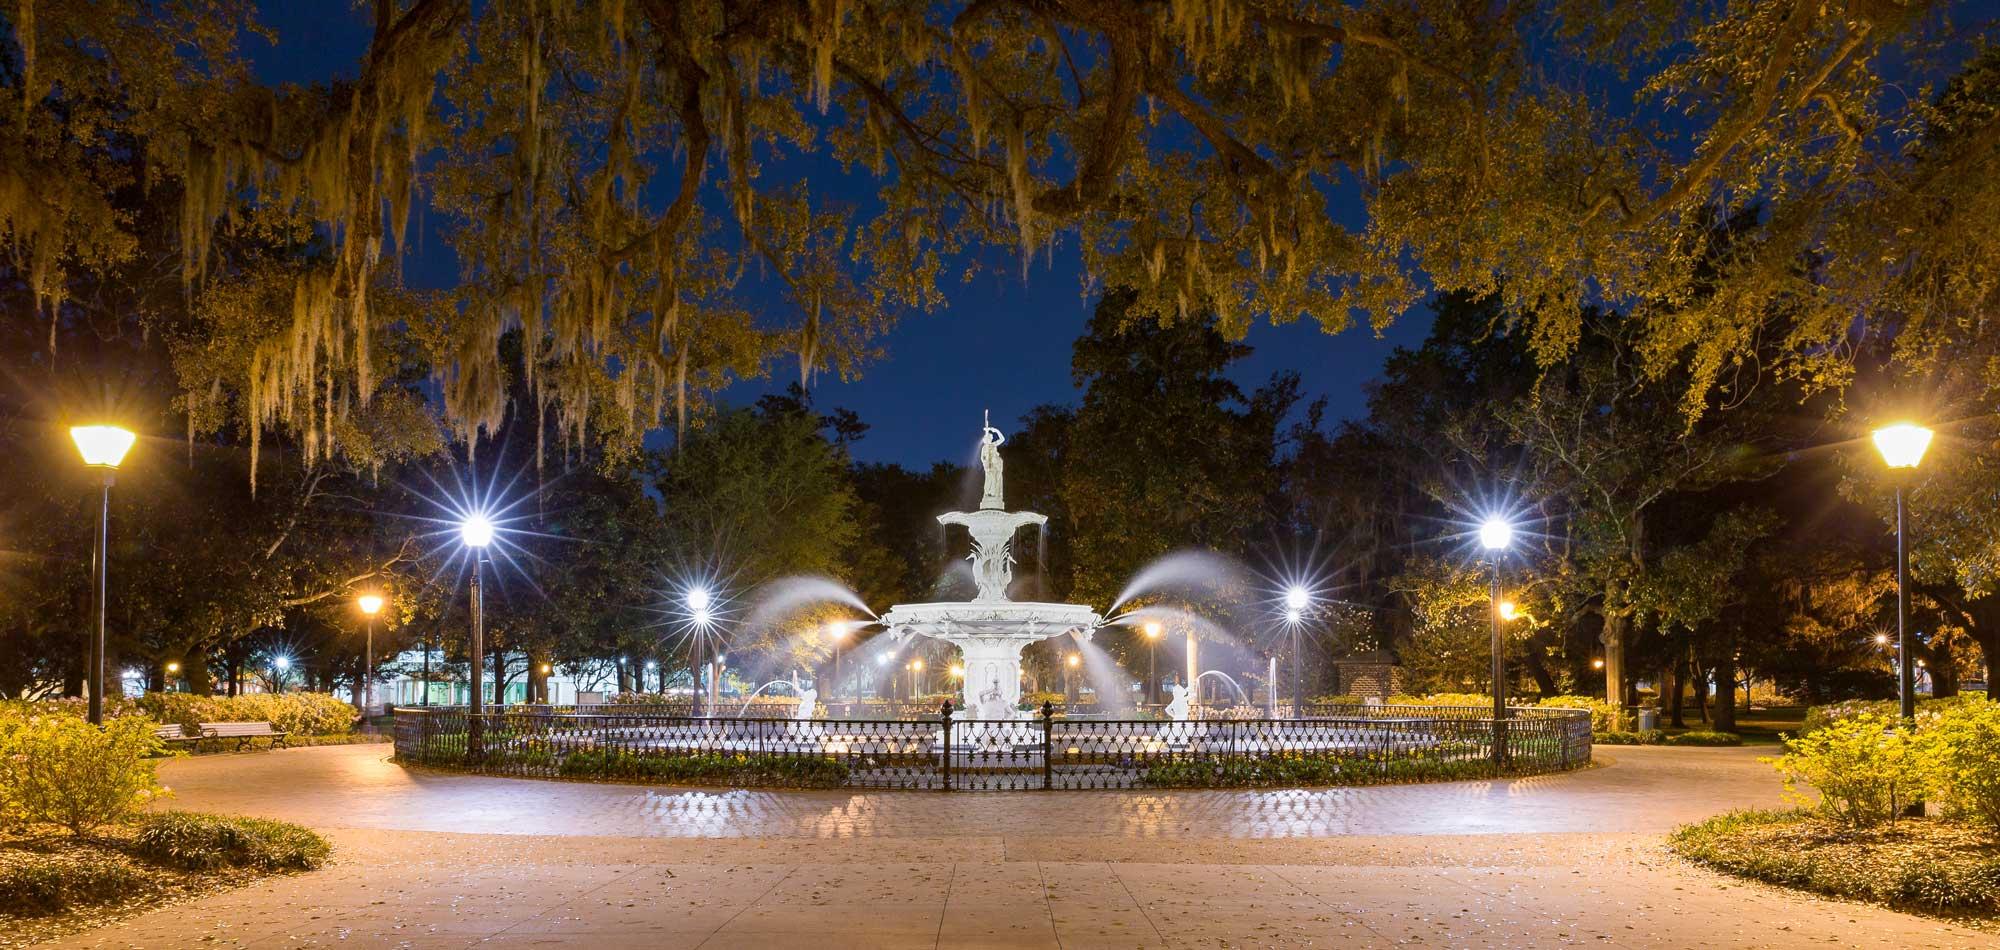 Water fountain at night - Forsyth fountain in historic Savannah, Georgia.